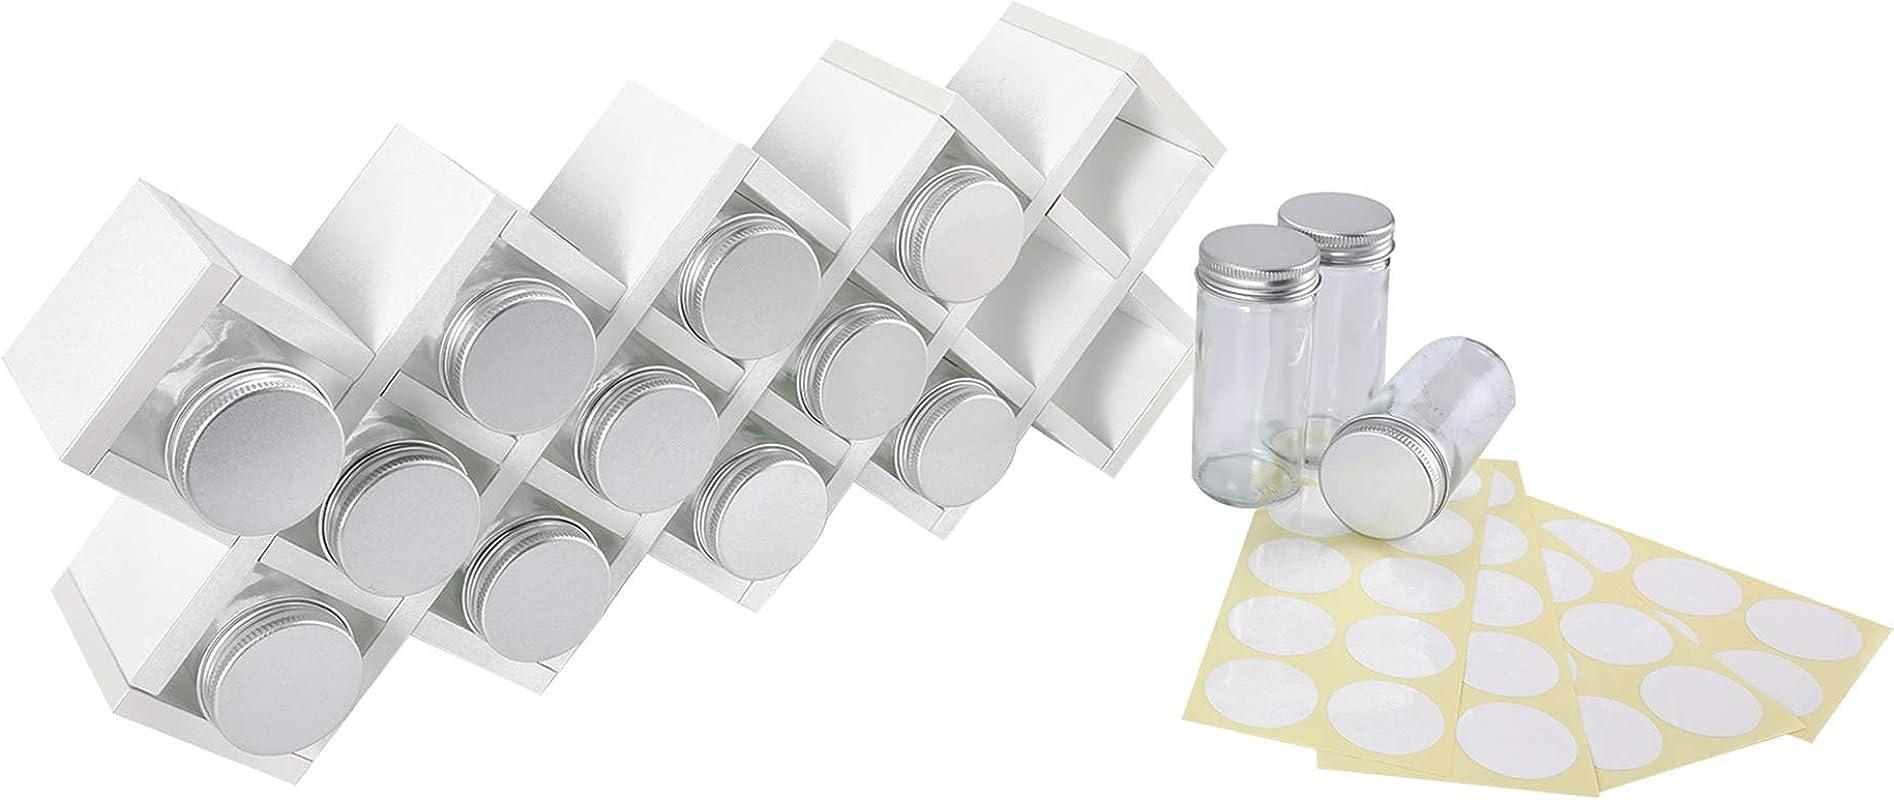 TQVAI Wooden 18 Jar Countertop Spice Rack Organizer With Labels White